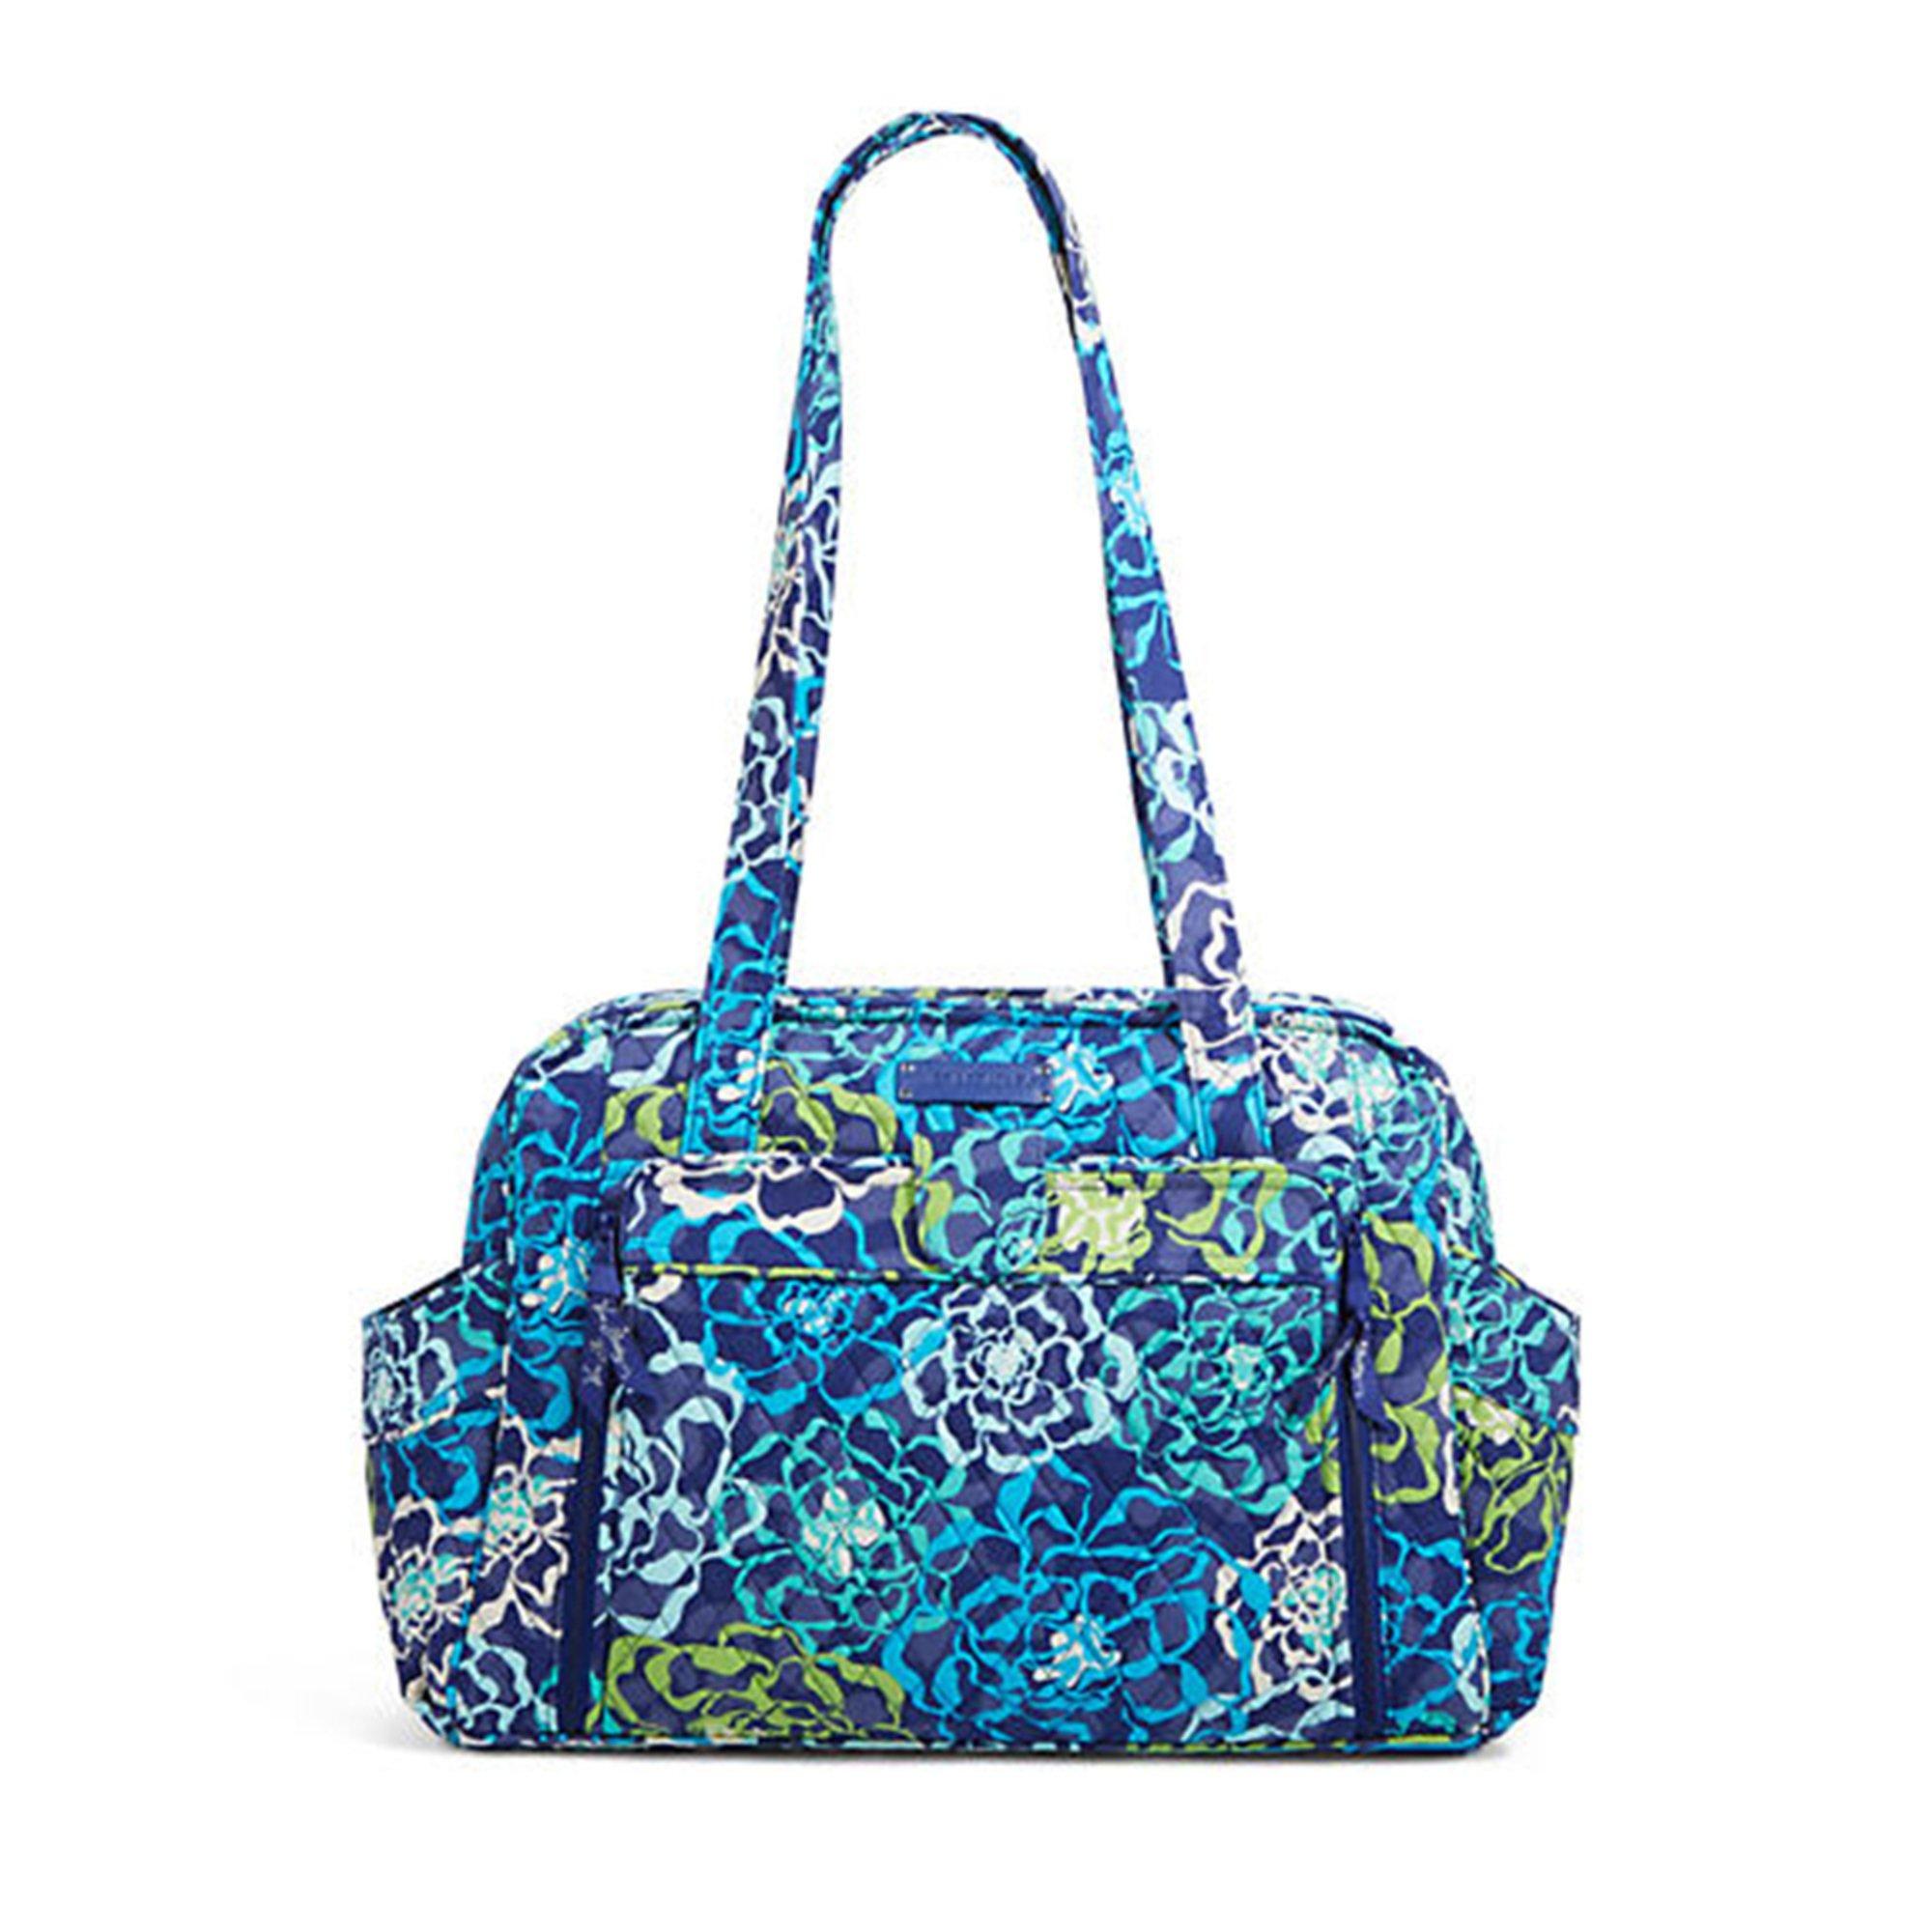 Vera Bradley Stroll Around Baby Bag Katalina Blue Totes